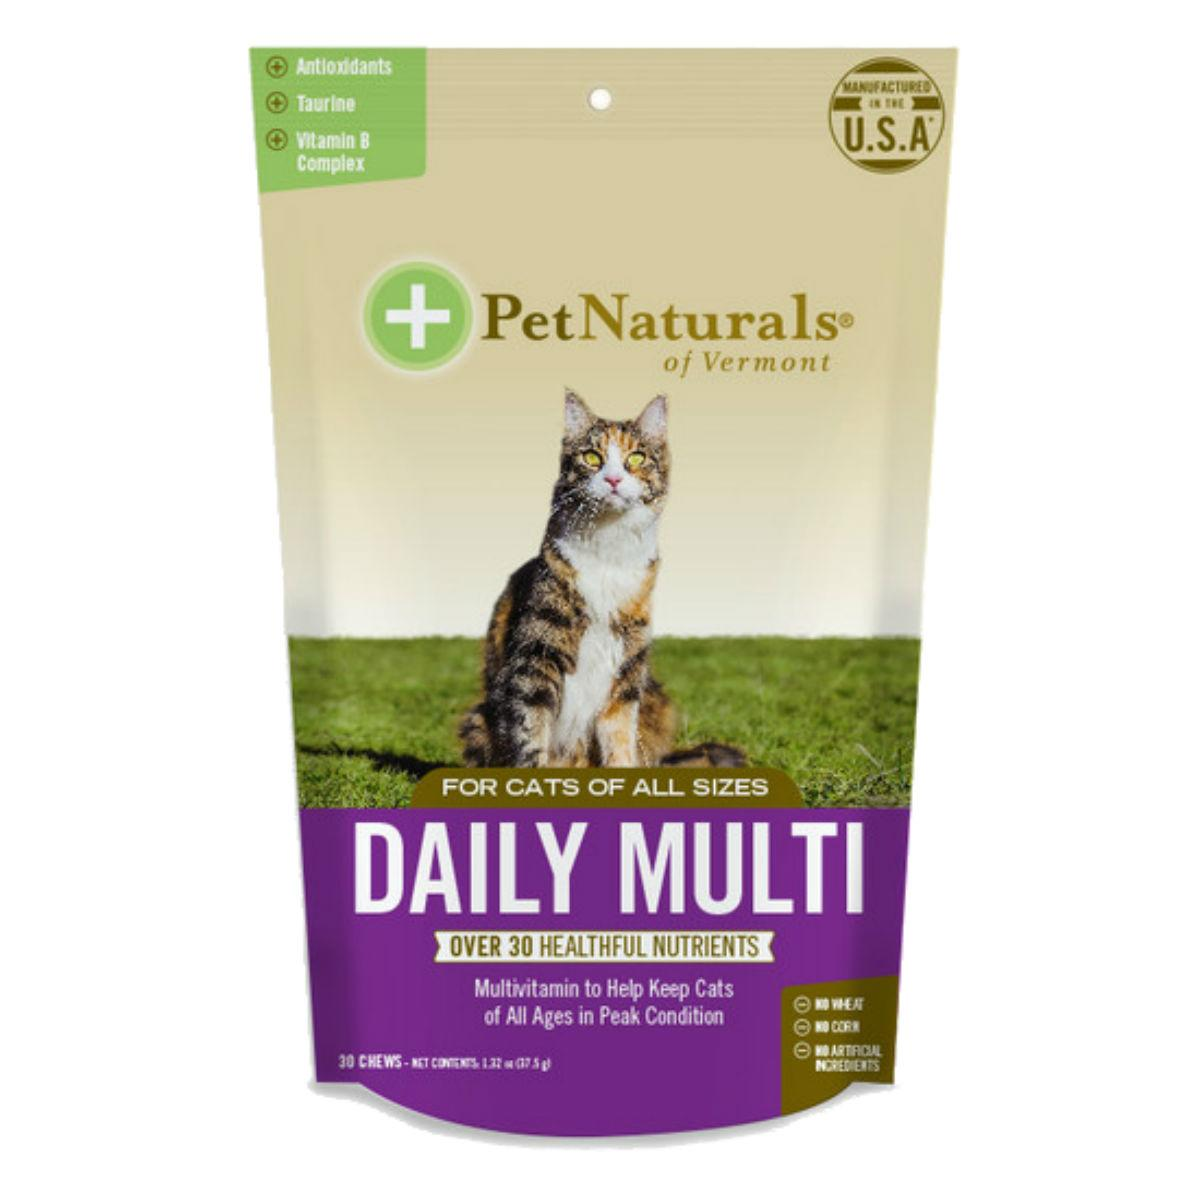 Pet Naturals Daily Multi Cat Chews